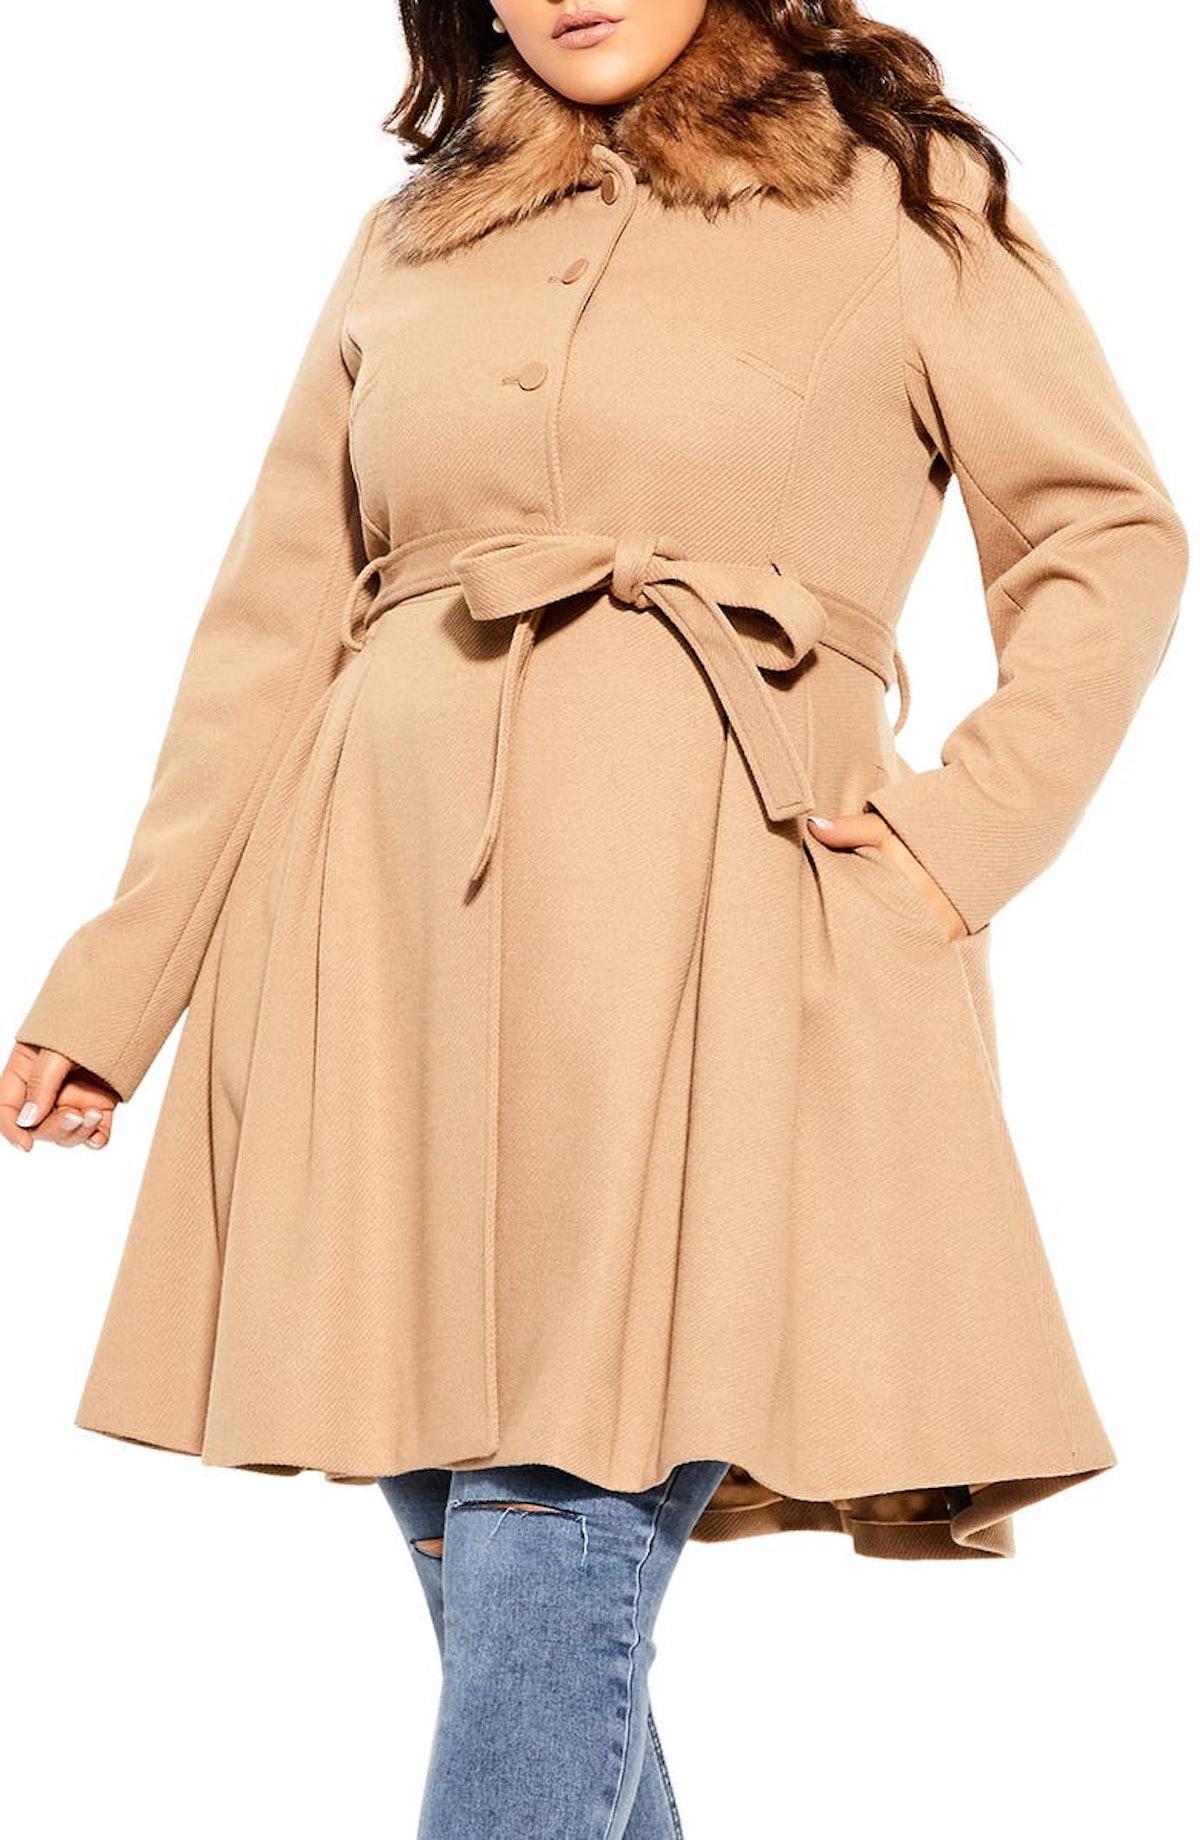 City Chic Blushing Belle Faux Fur Collar Coat